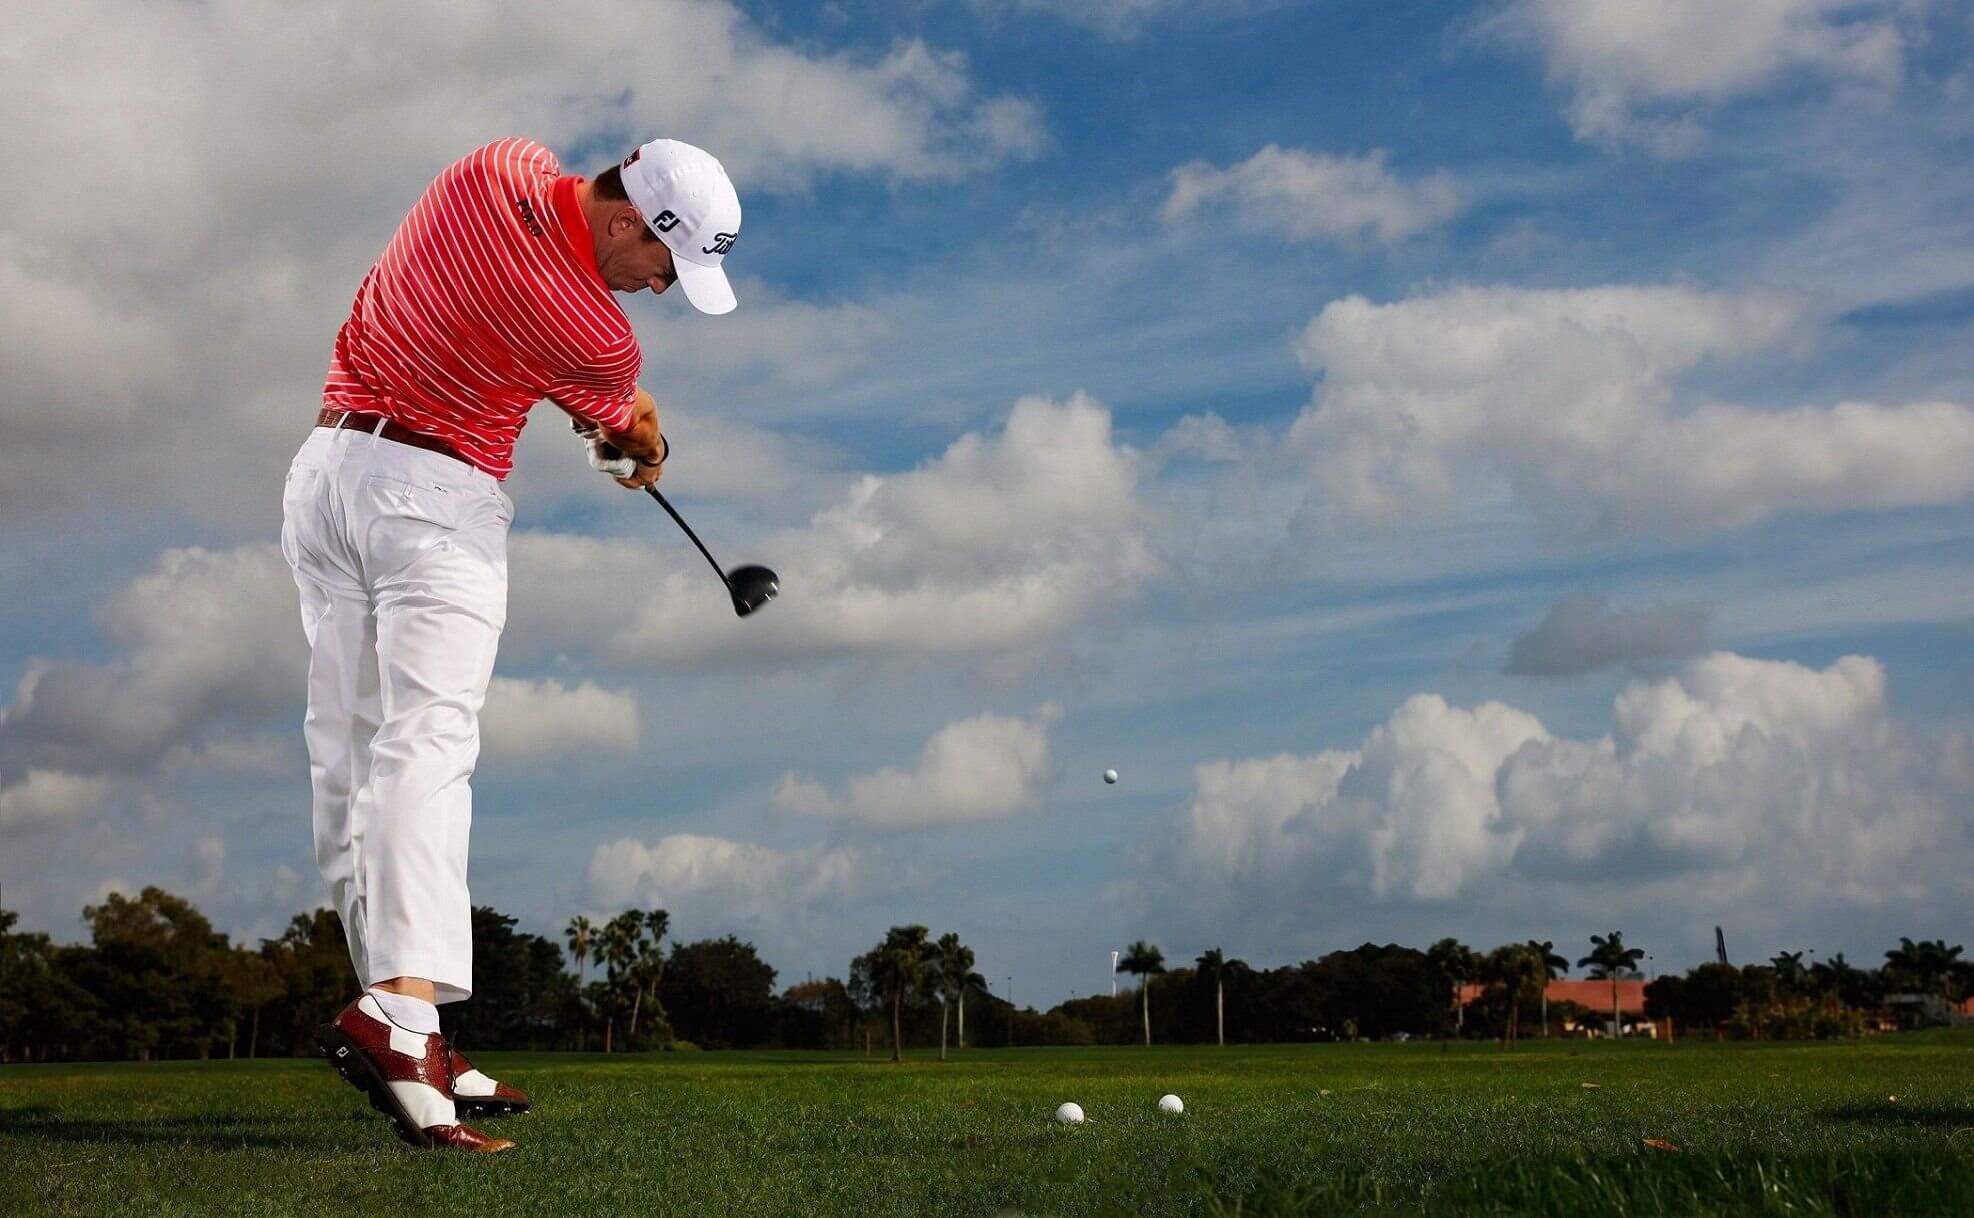 Golfinstruktioner på video